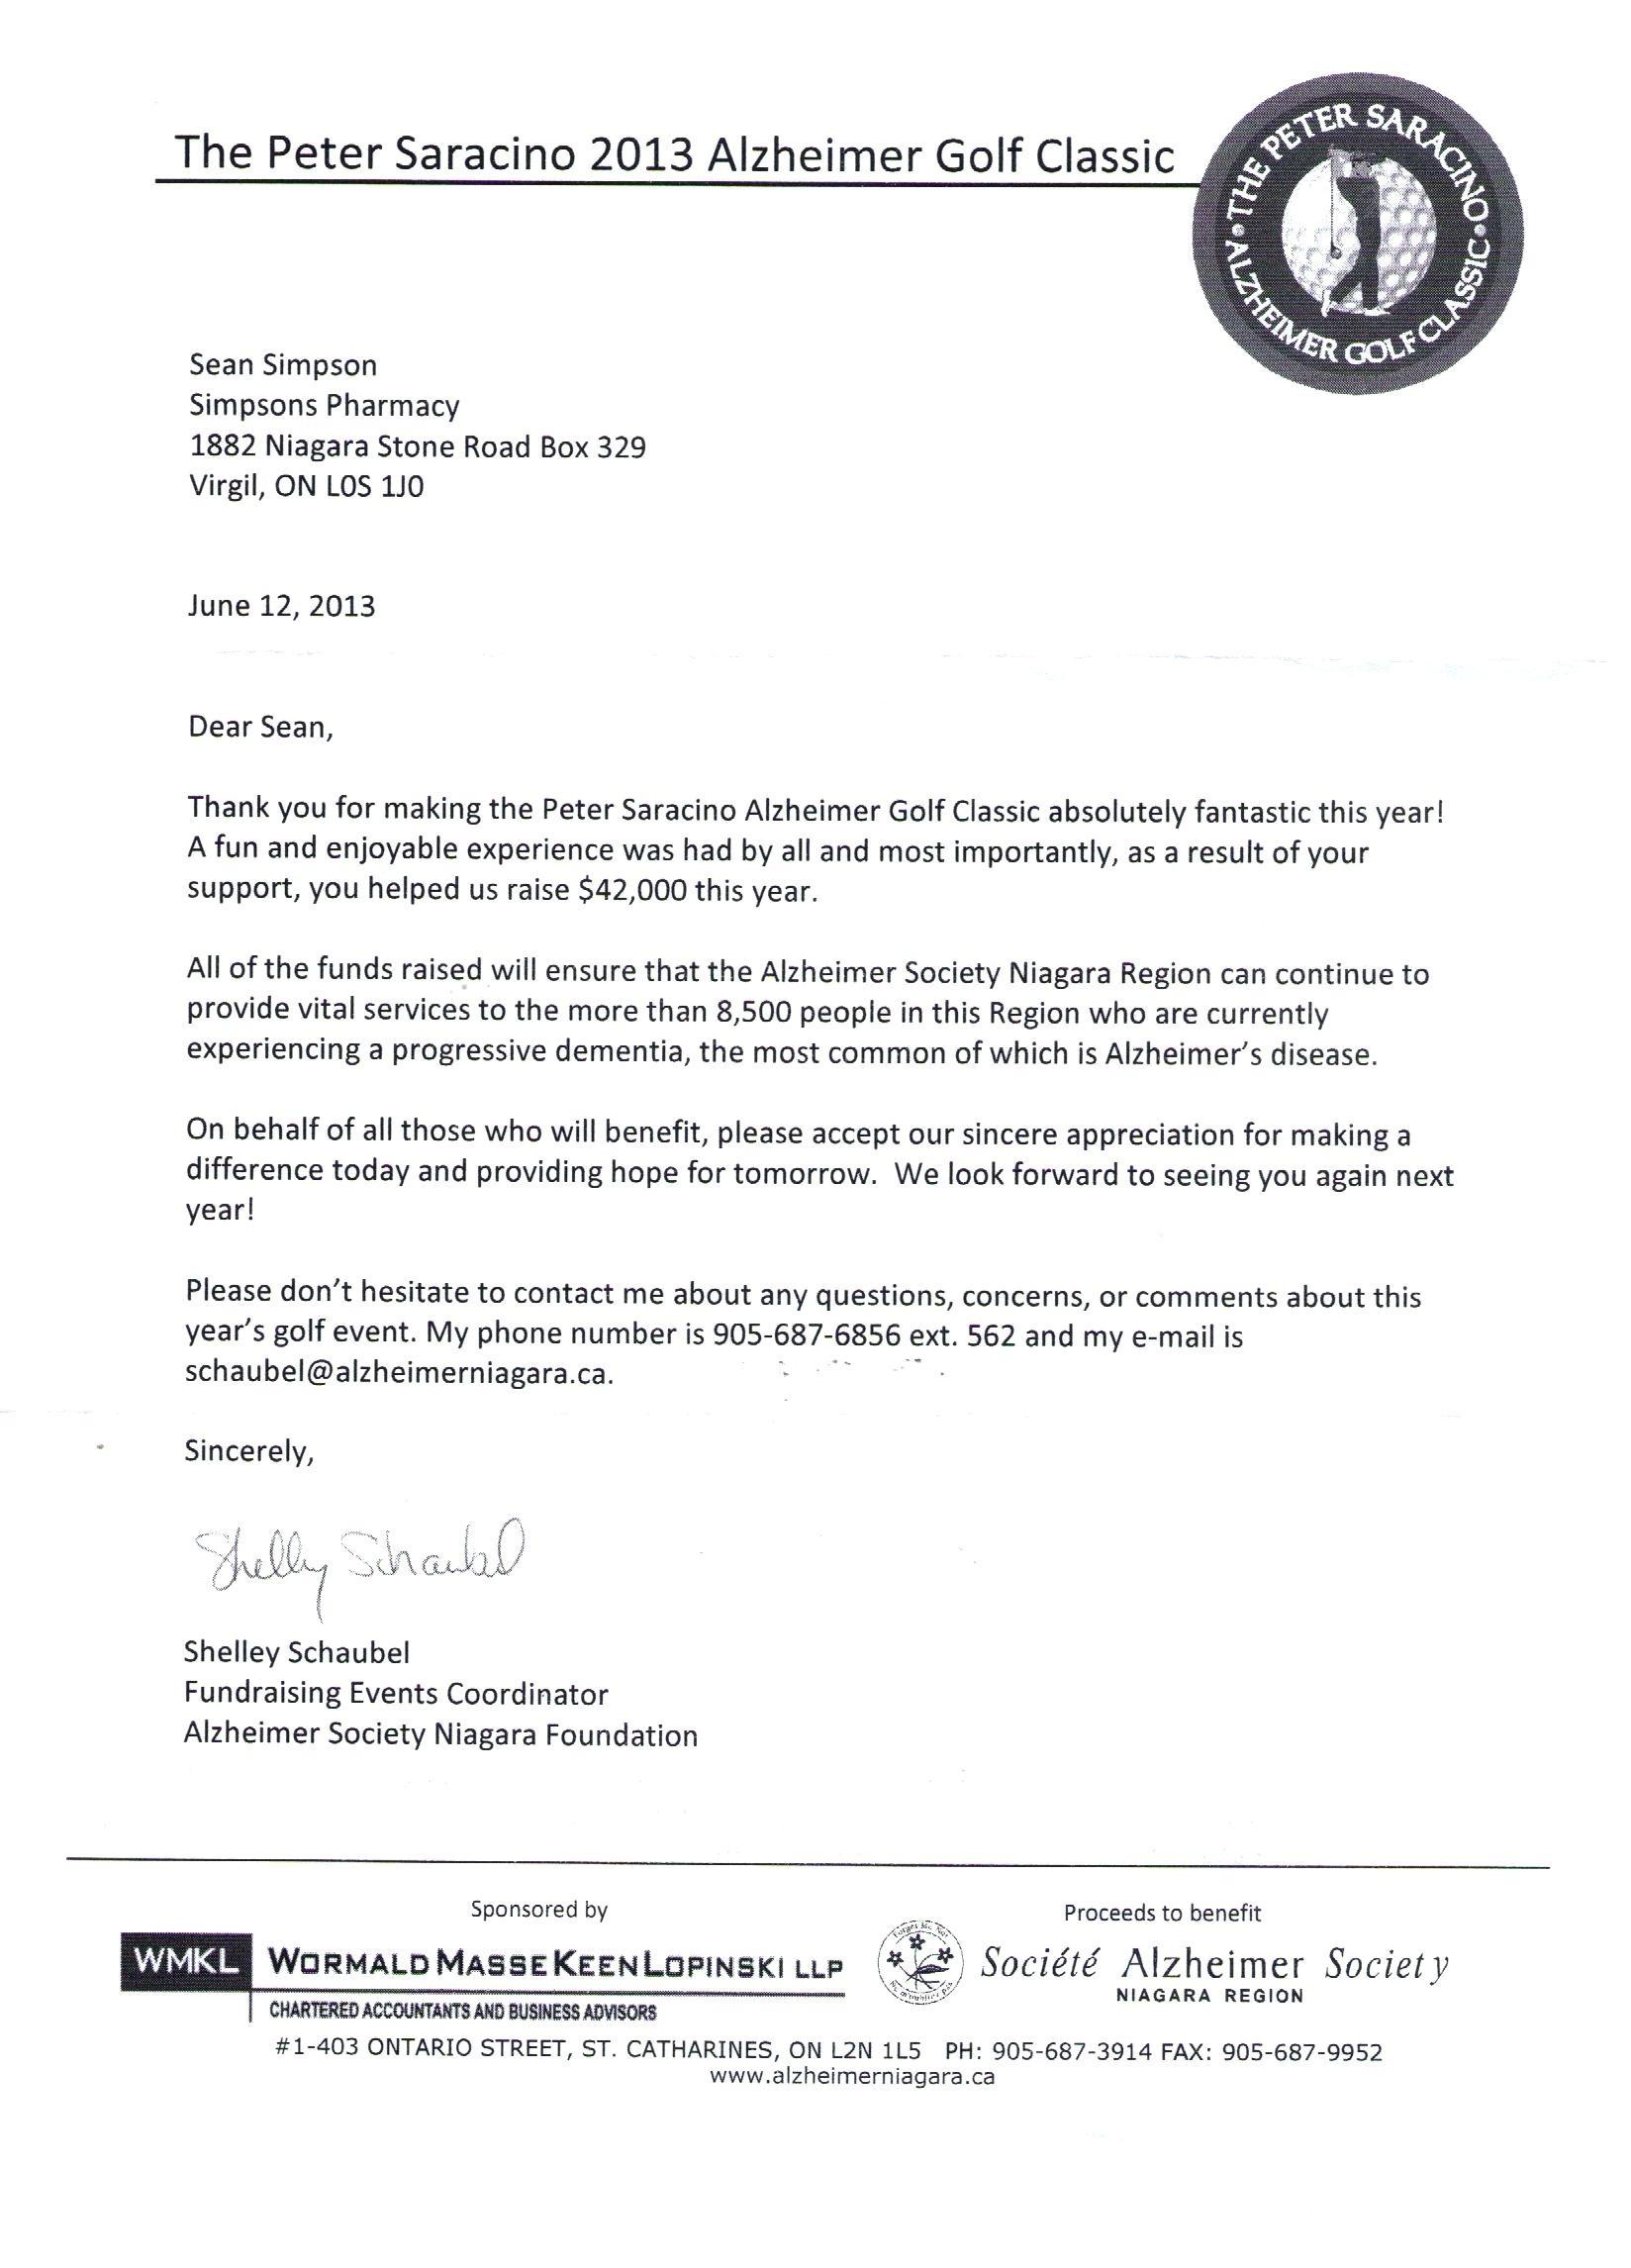 Golf tournament Sponsorship Letter Template - Sponsorship Letter for Sports Refrence Template Sport Sponsorship